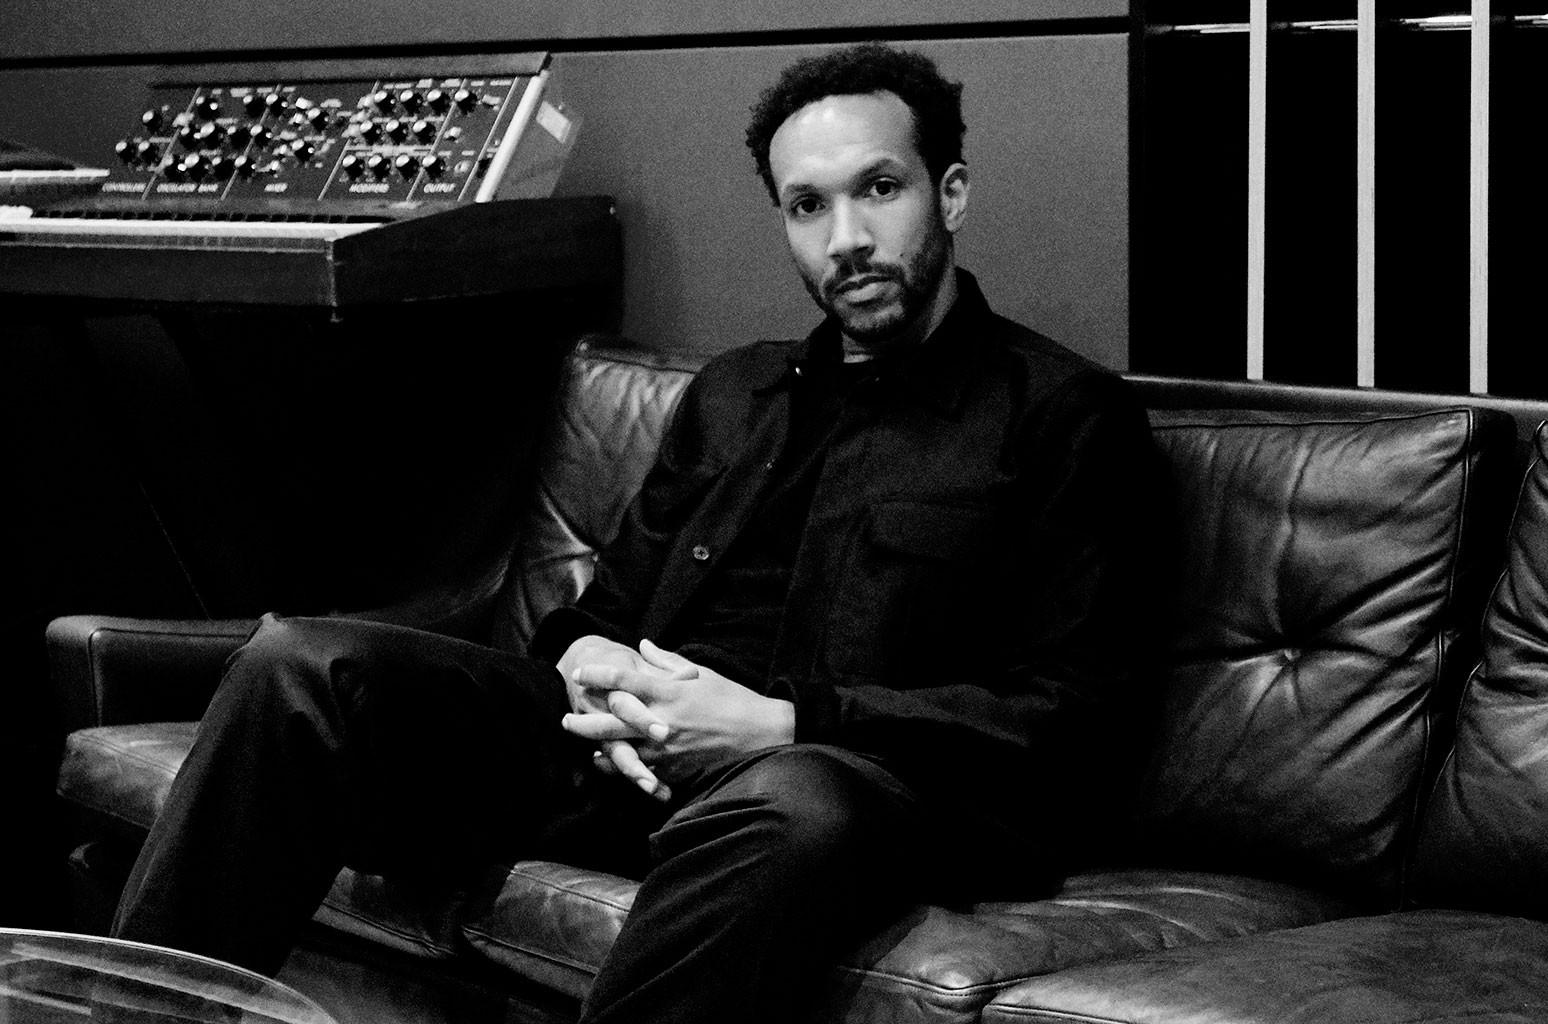 Warner Music UK Ups Joe Kentish to President, Replacing Phil Christie